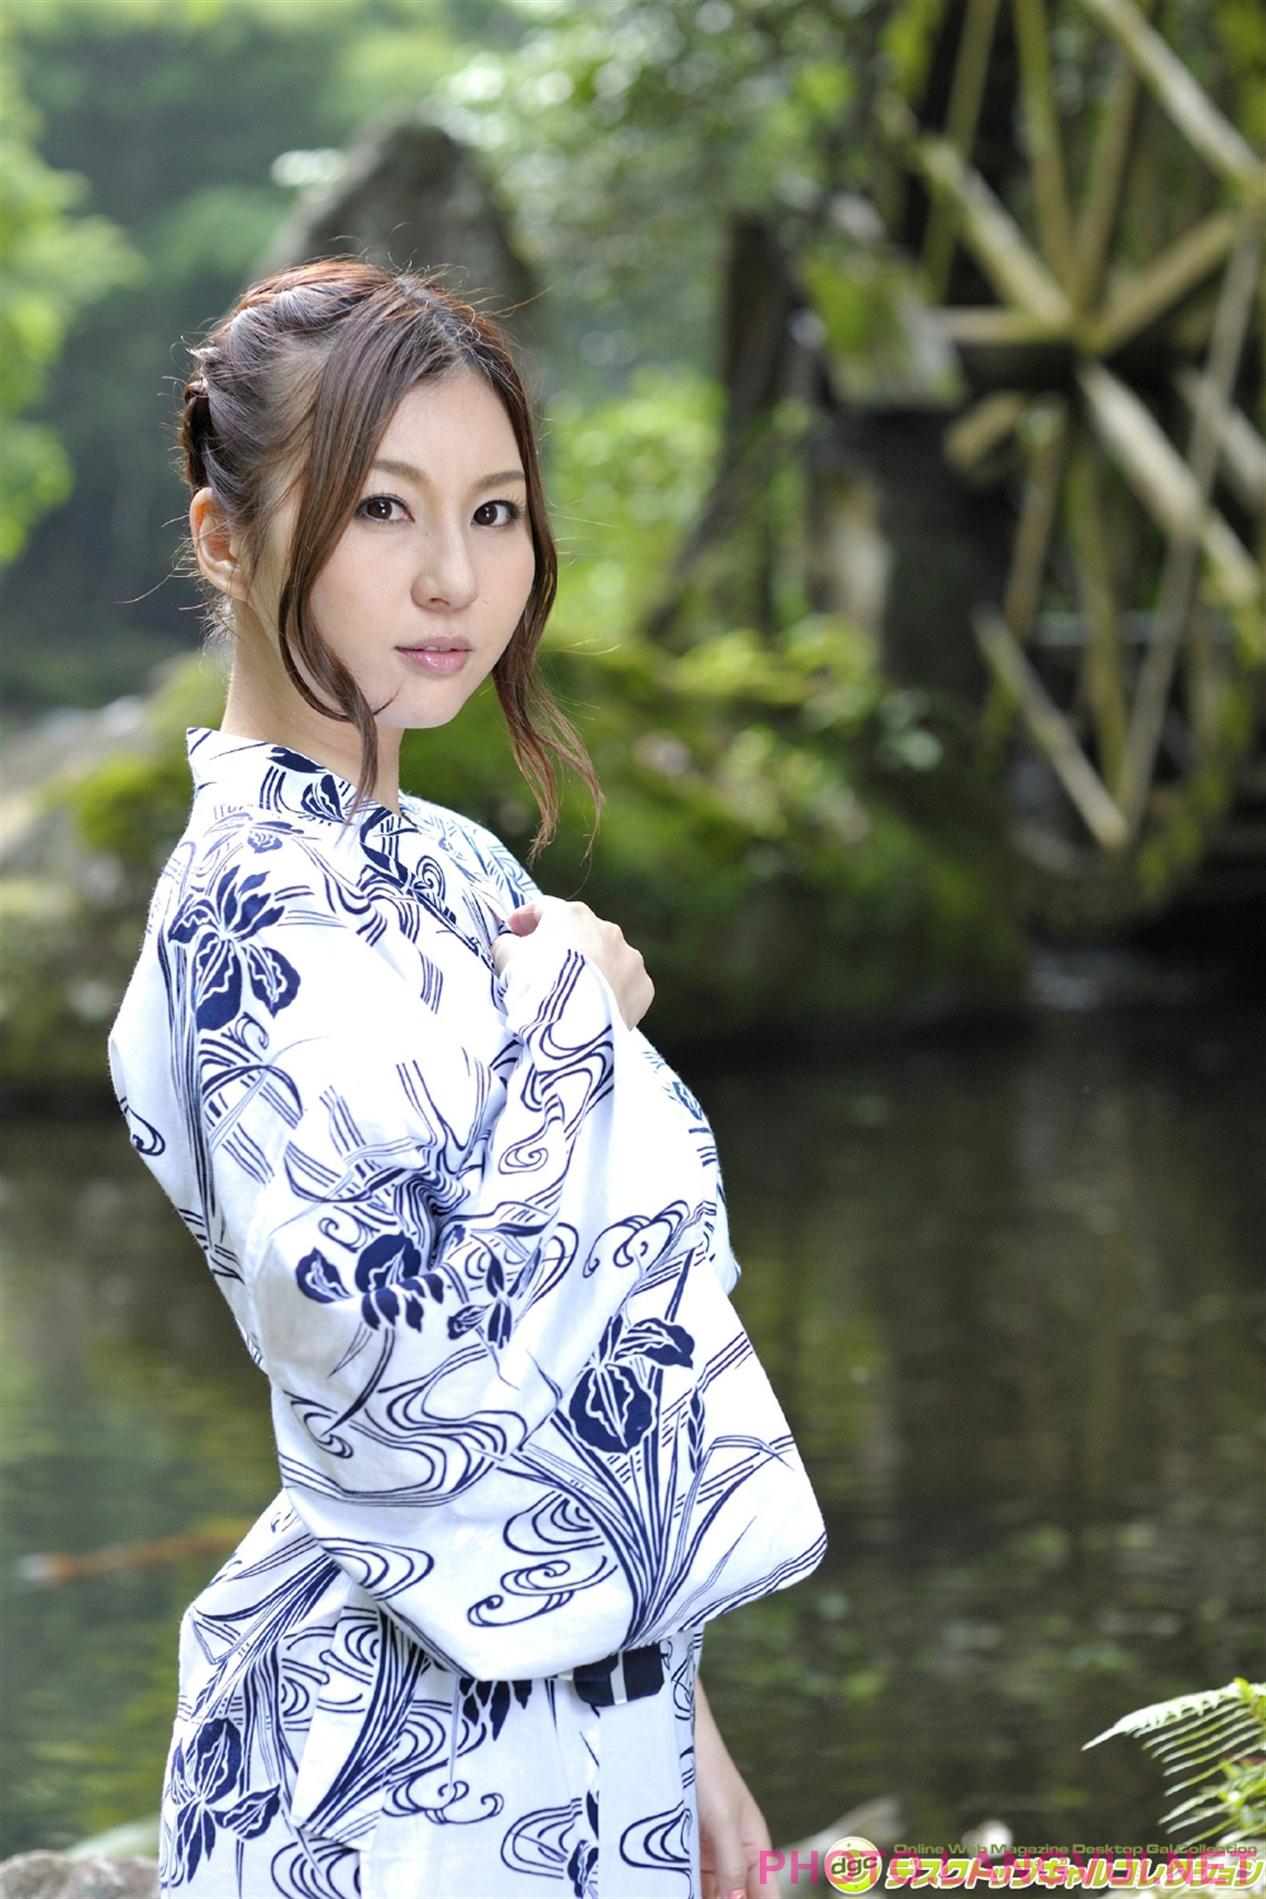 DGC No 1213 Yui Tatsumi - Page 7 of 11 - Ảnh Girl Xinh